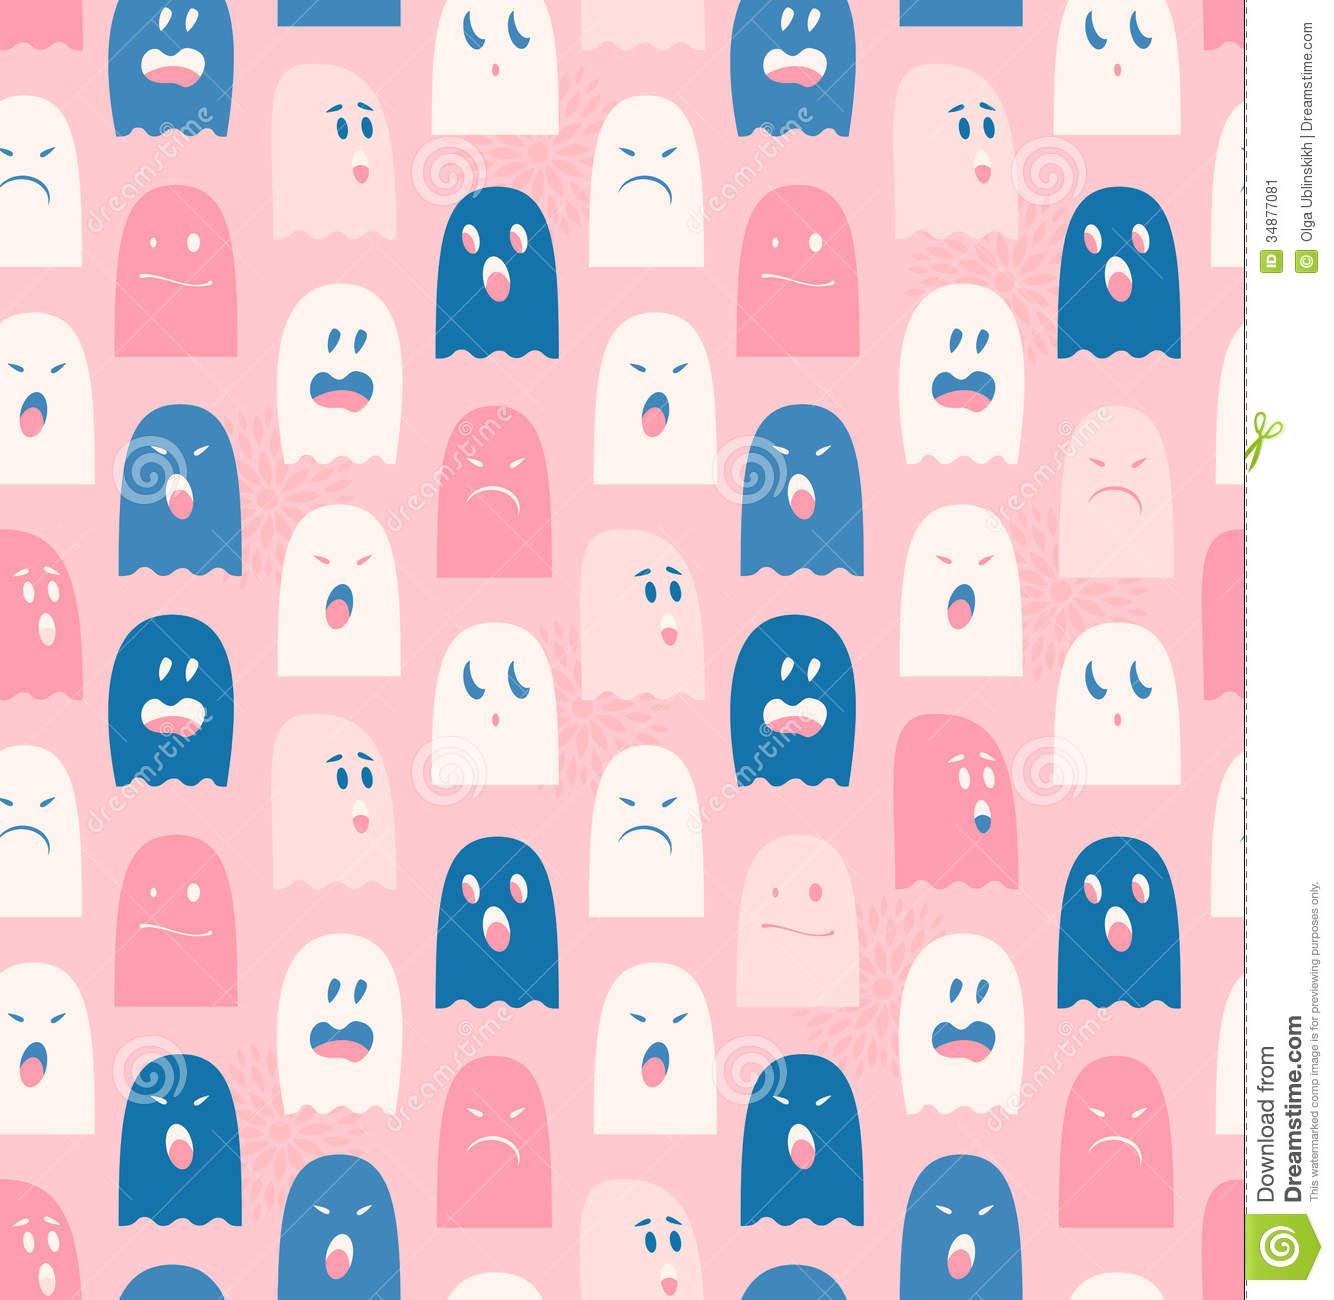 Ghostly clipart cute tumblr Cute Background  inSharePics Seamless